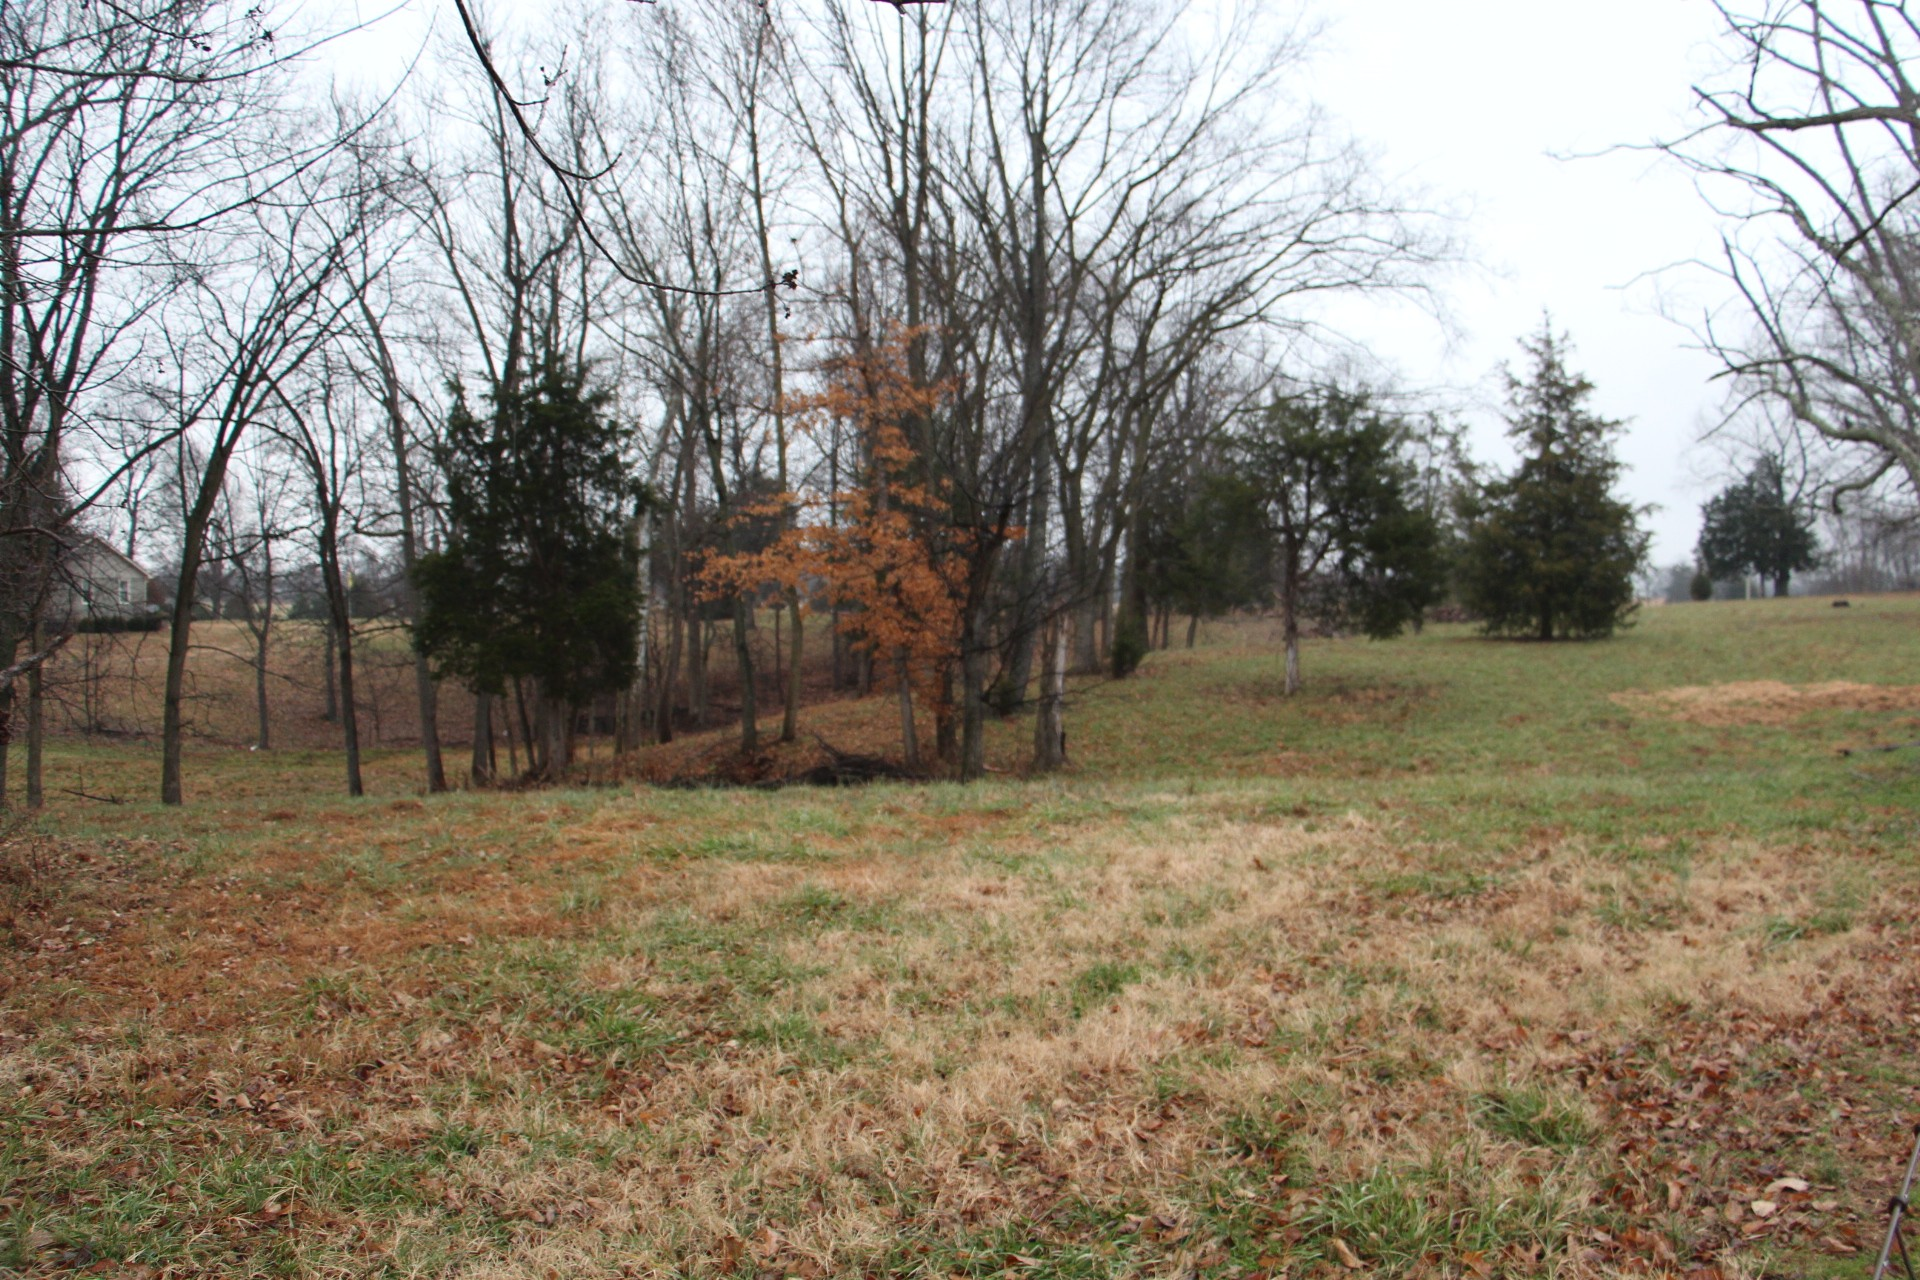 0 Hwy 49 E, E, Springfield, TN 37172 - Springfield, TN real estate listing